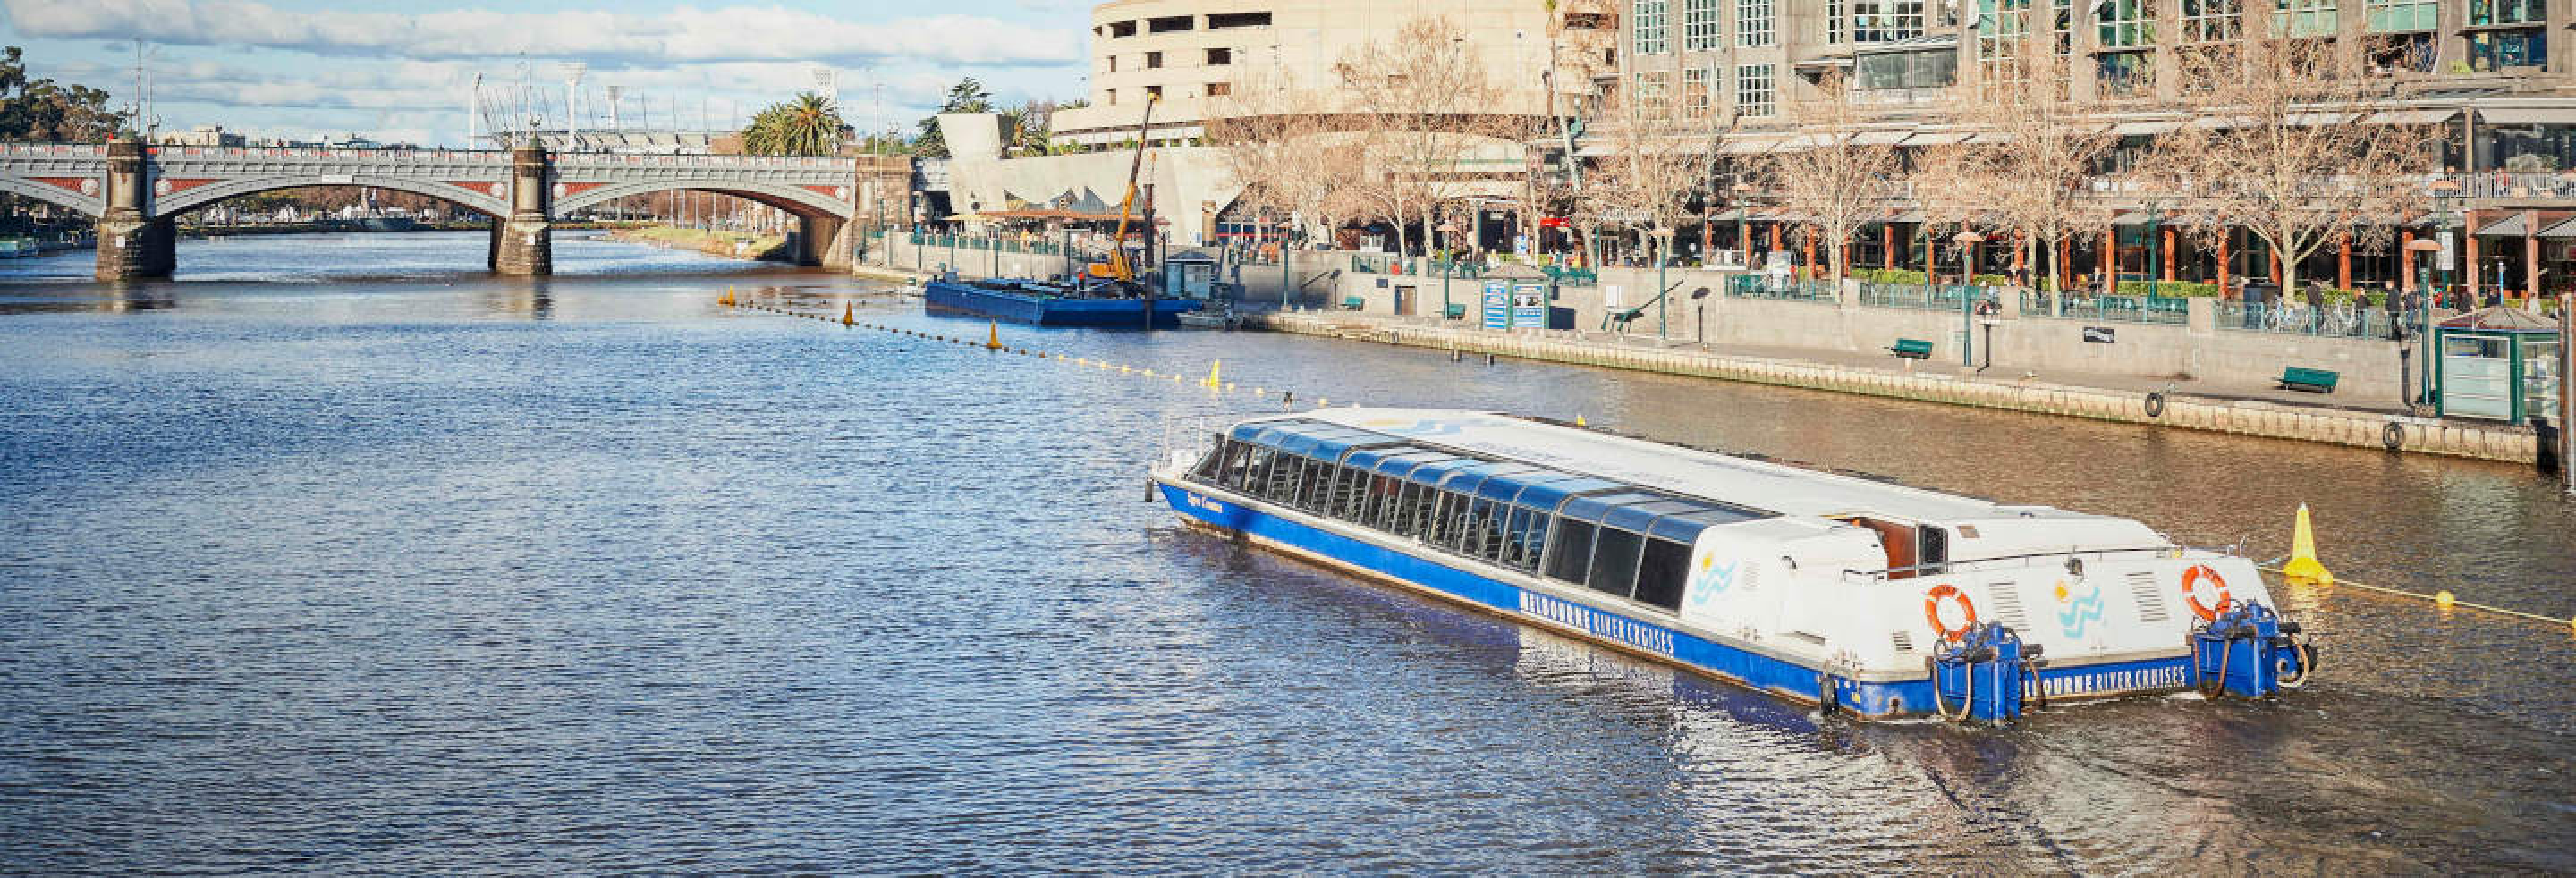 Passeio de barco por Melbourne